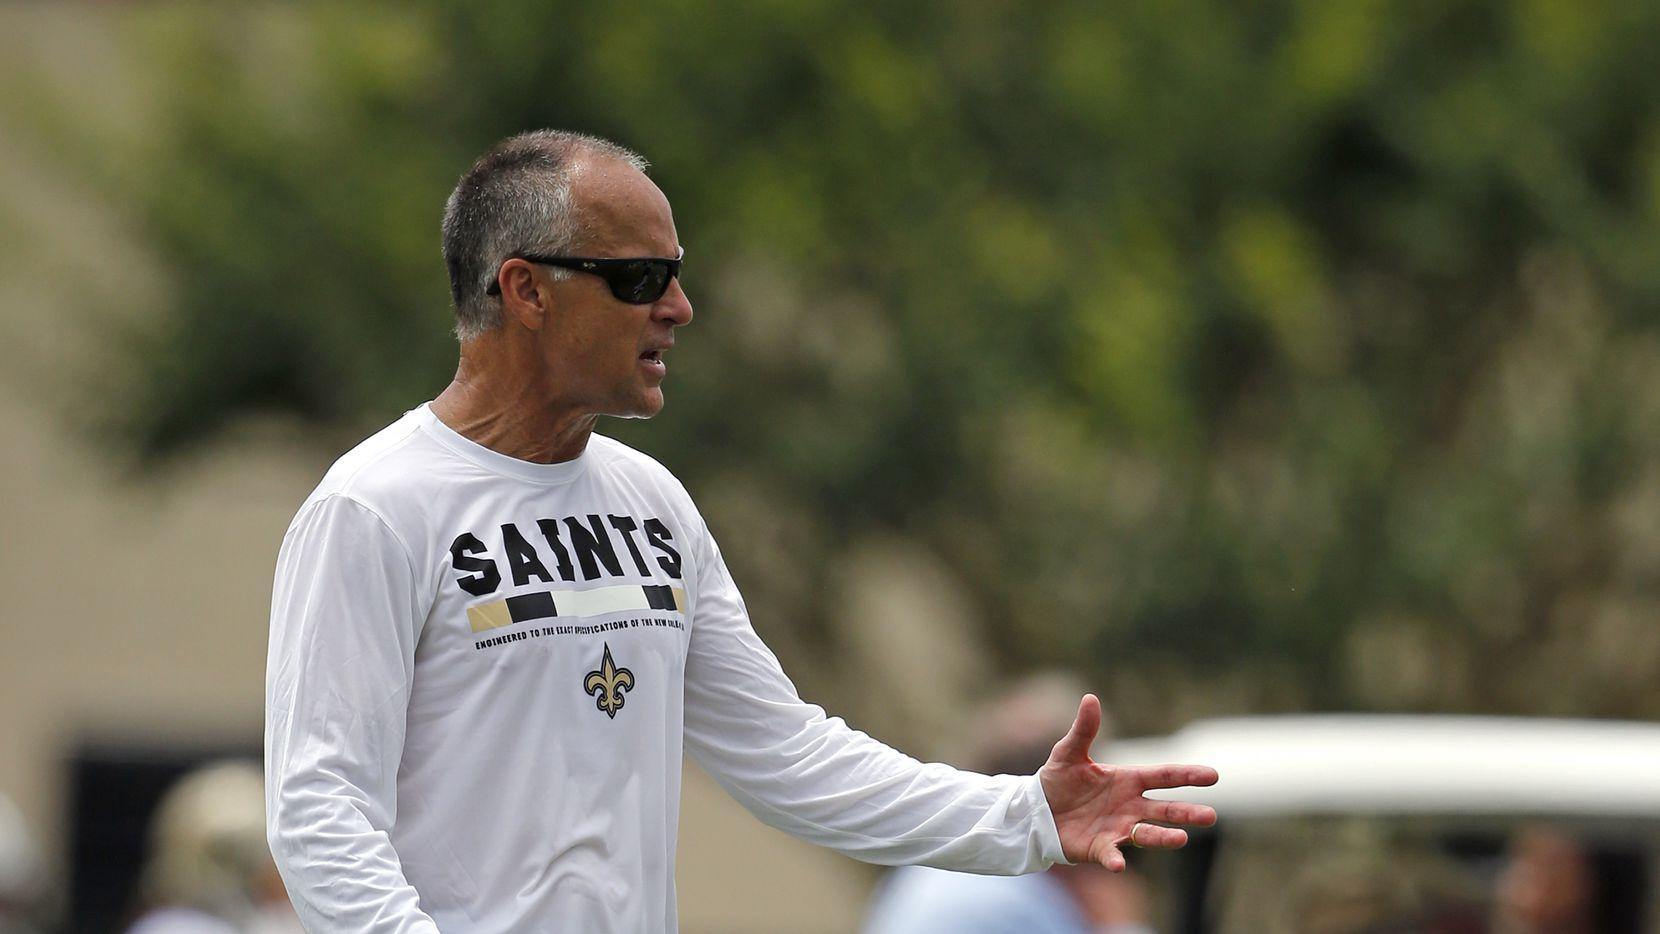 New Orleans Saints linebacker coach Mike Nolan runs drills during NFL football practice in Metairie, La., Tuesday, June 13, 2017. (AP Photo/Gerald Herbert)